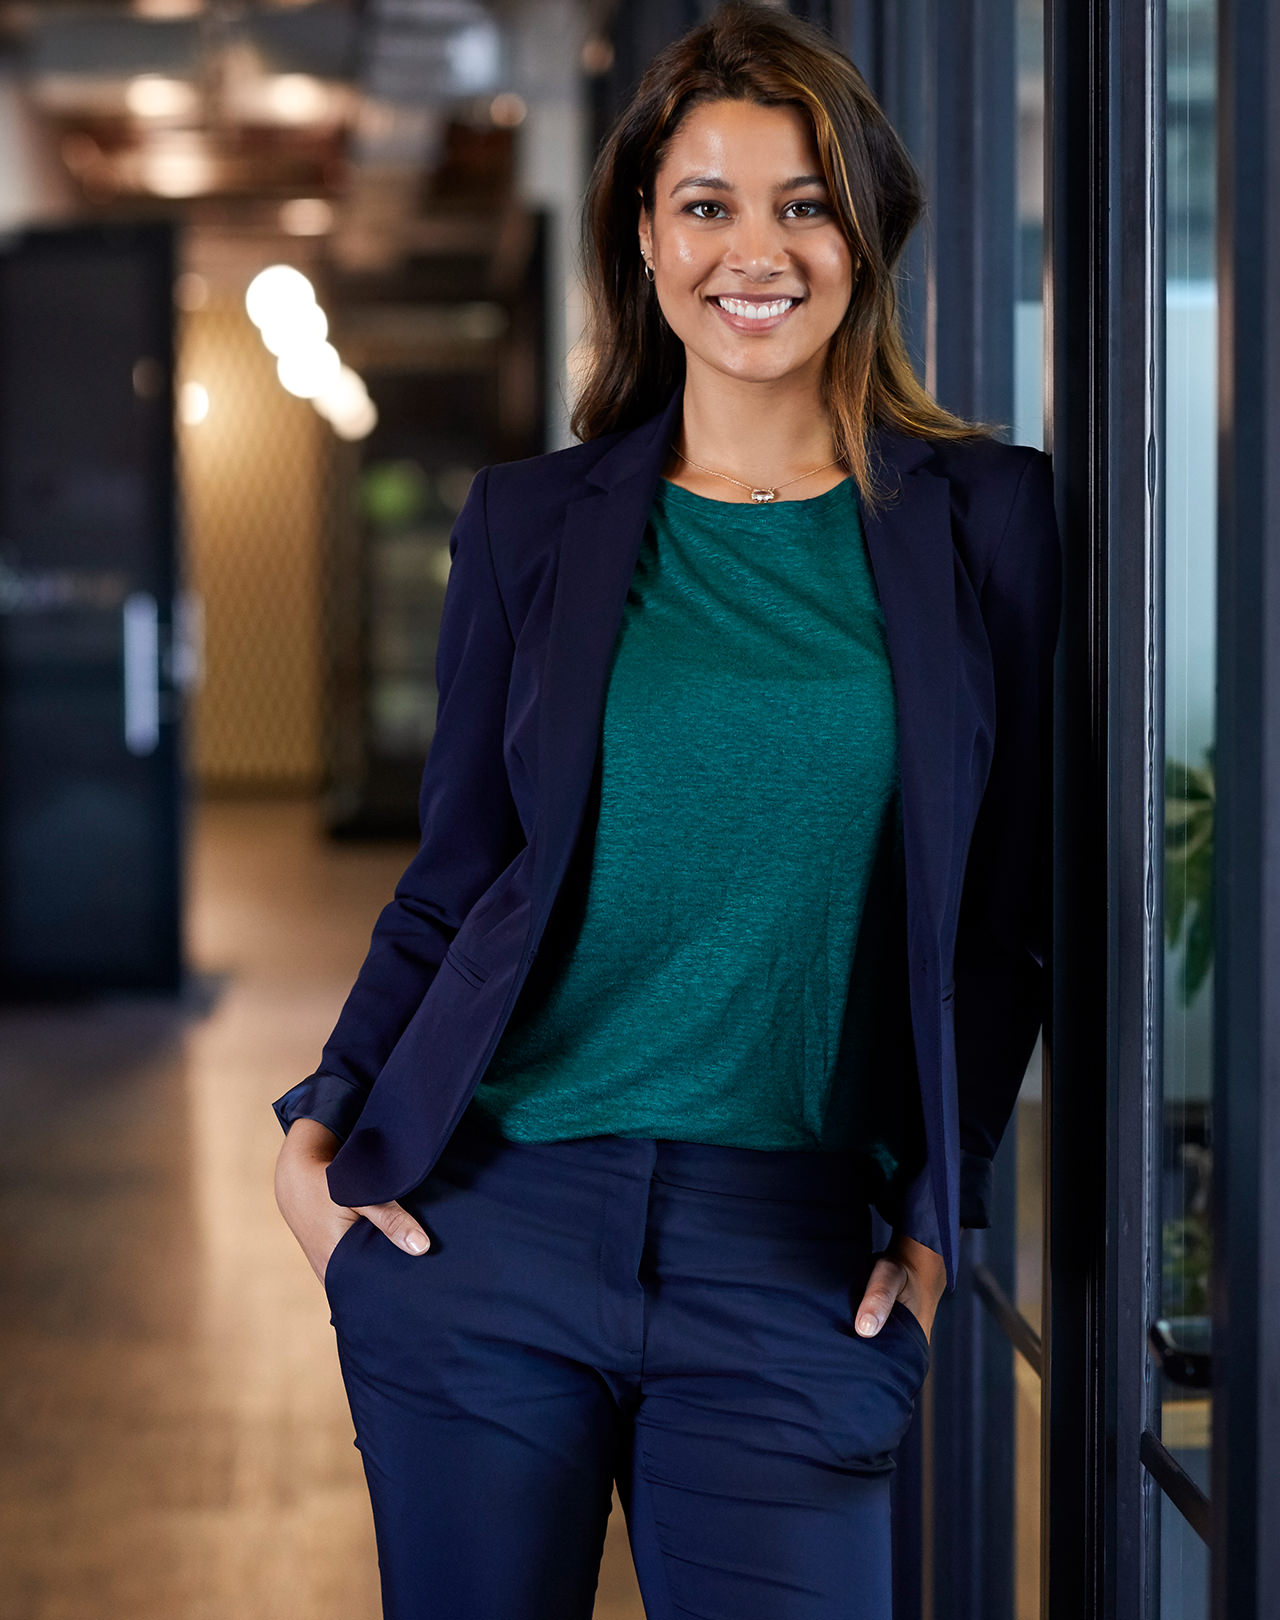 Castlepoint Wealth Advisors clients - business woman living abundantly